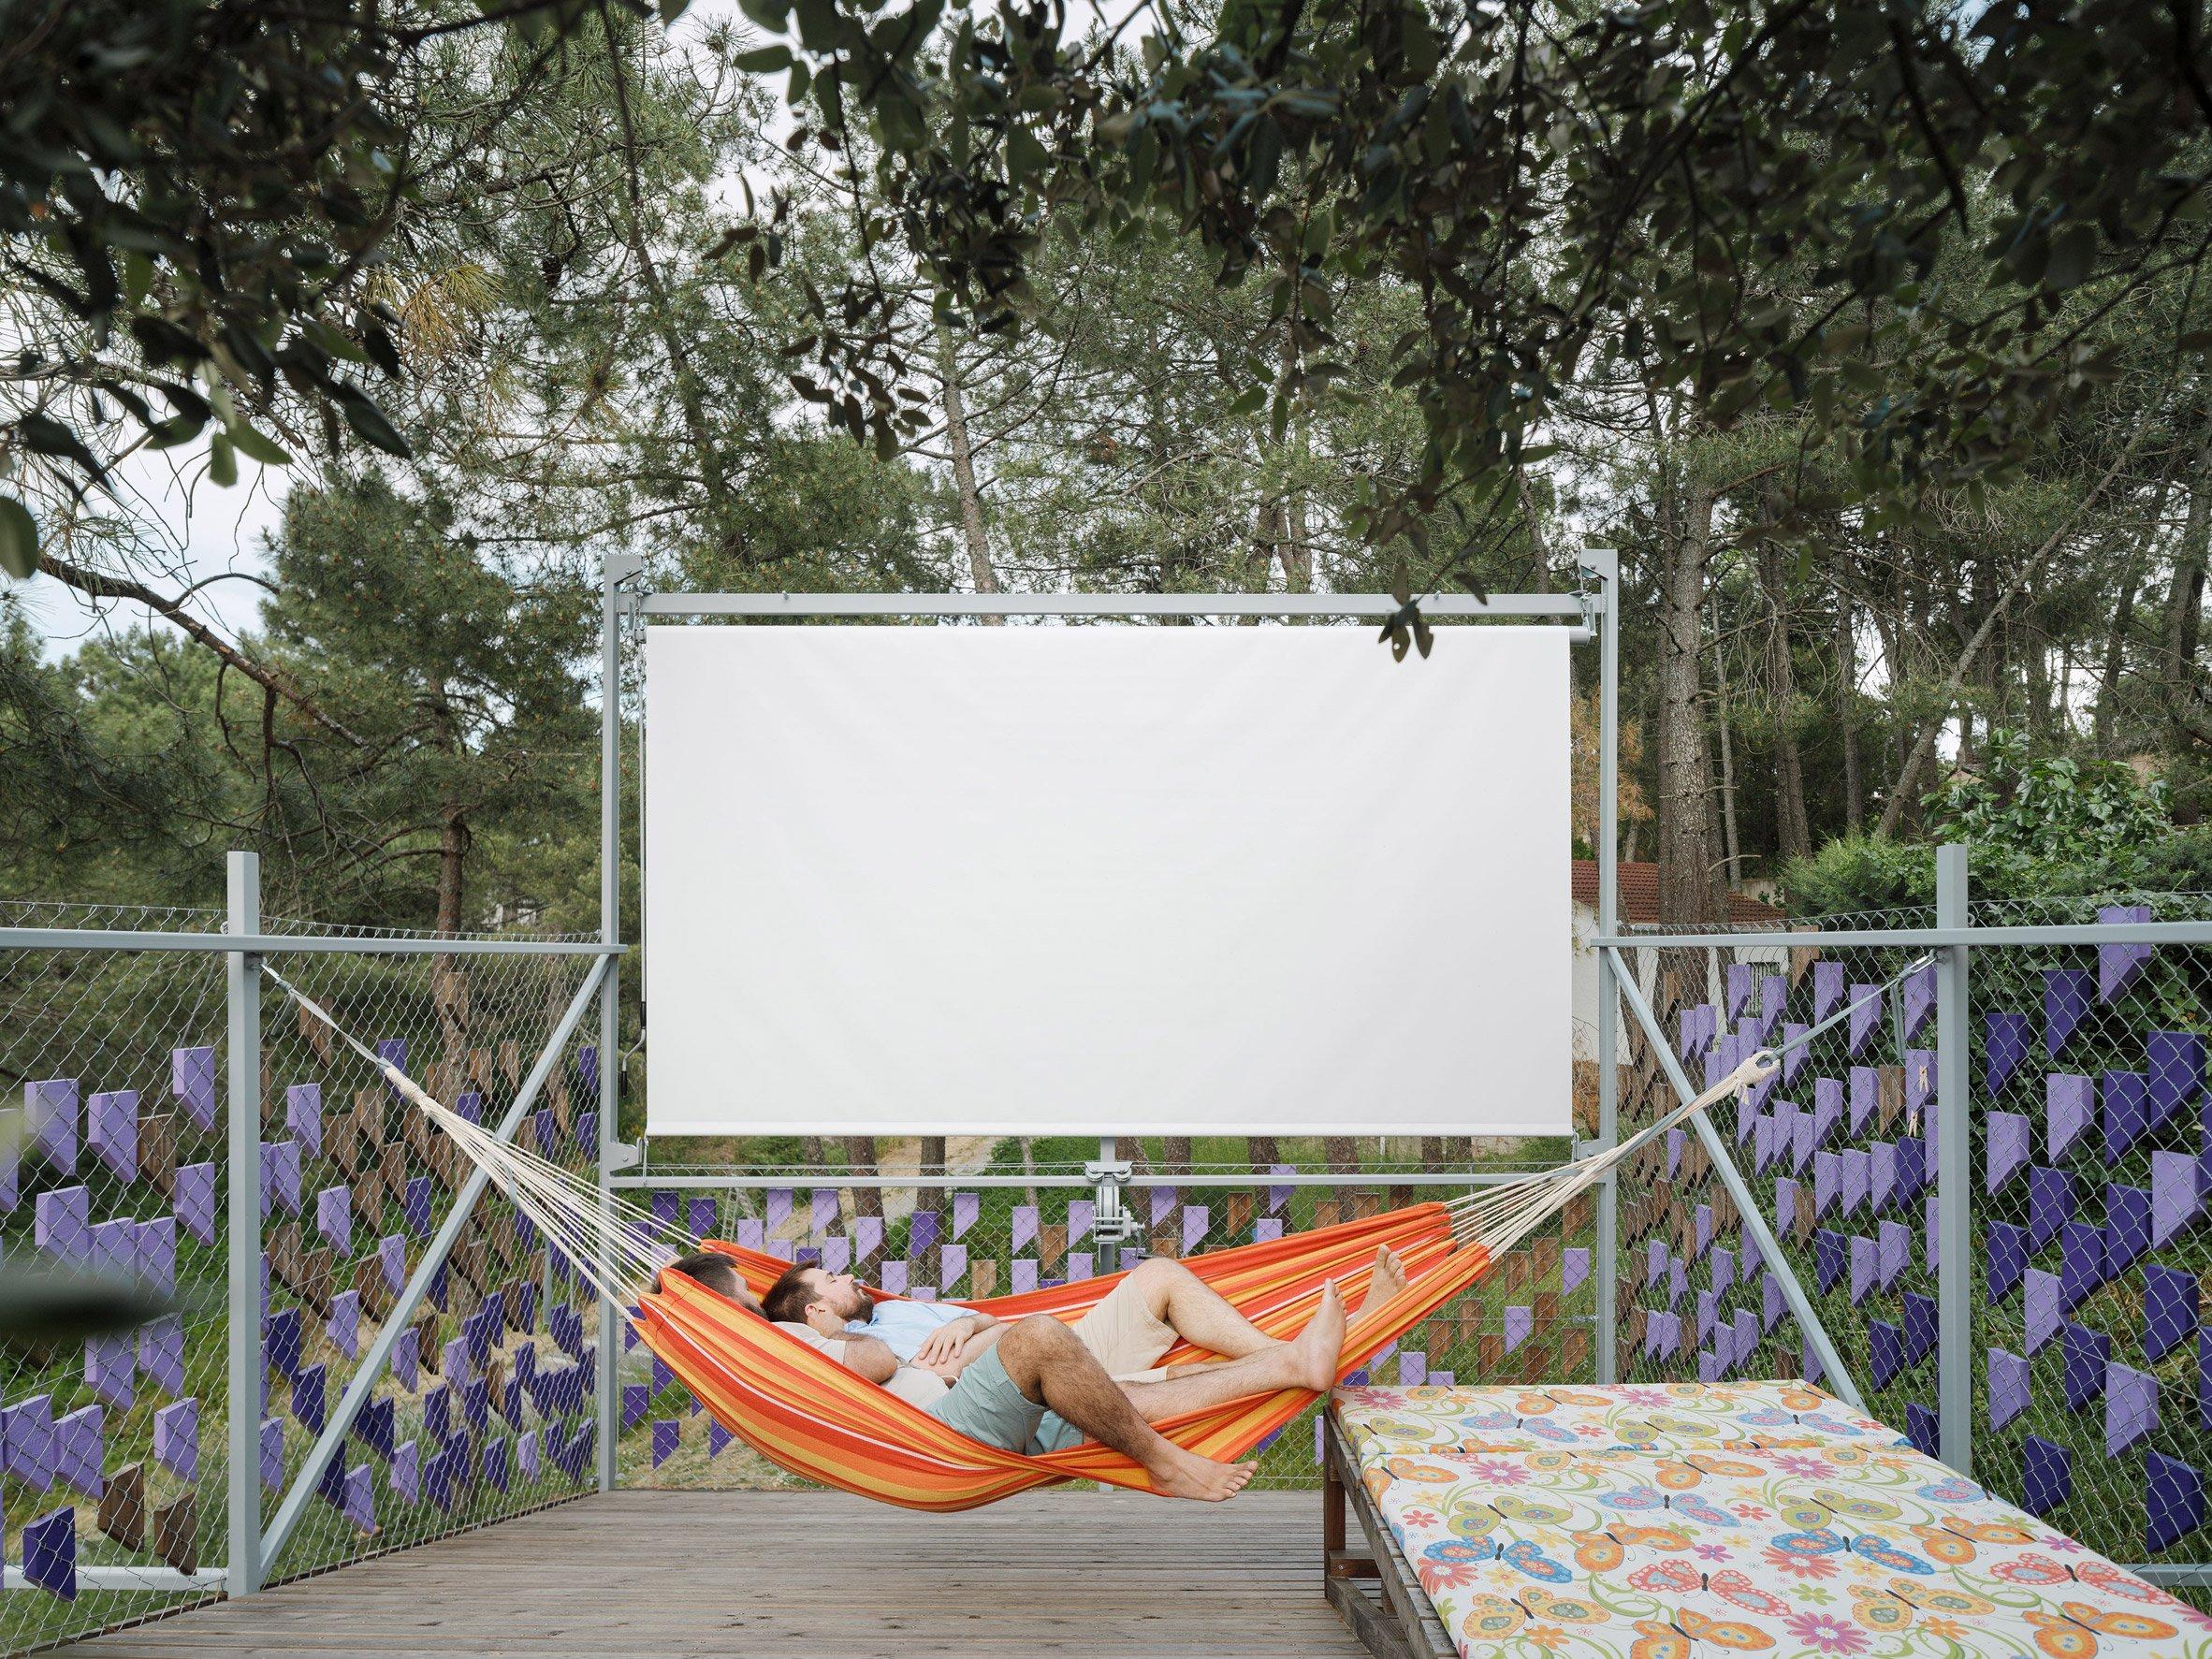 Roof-top film screening area